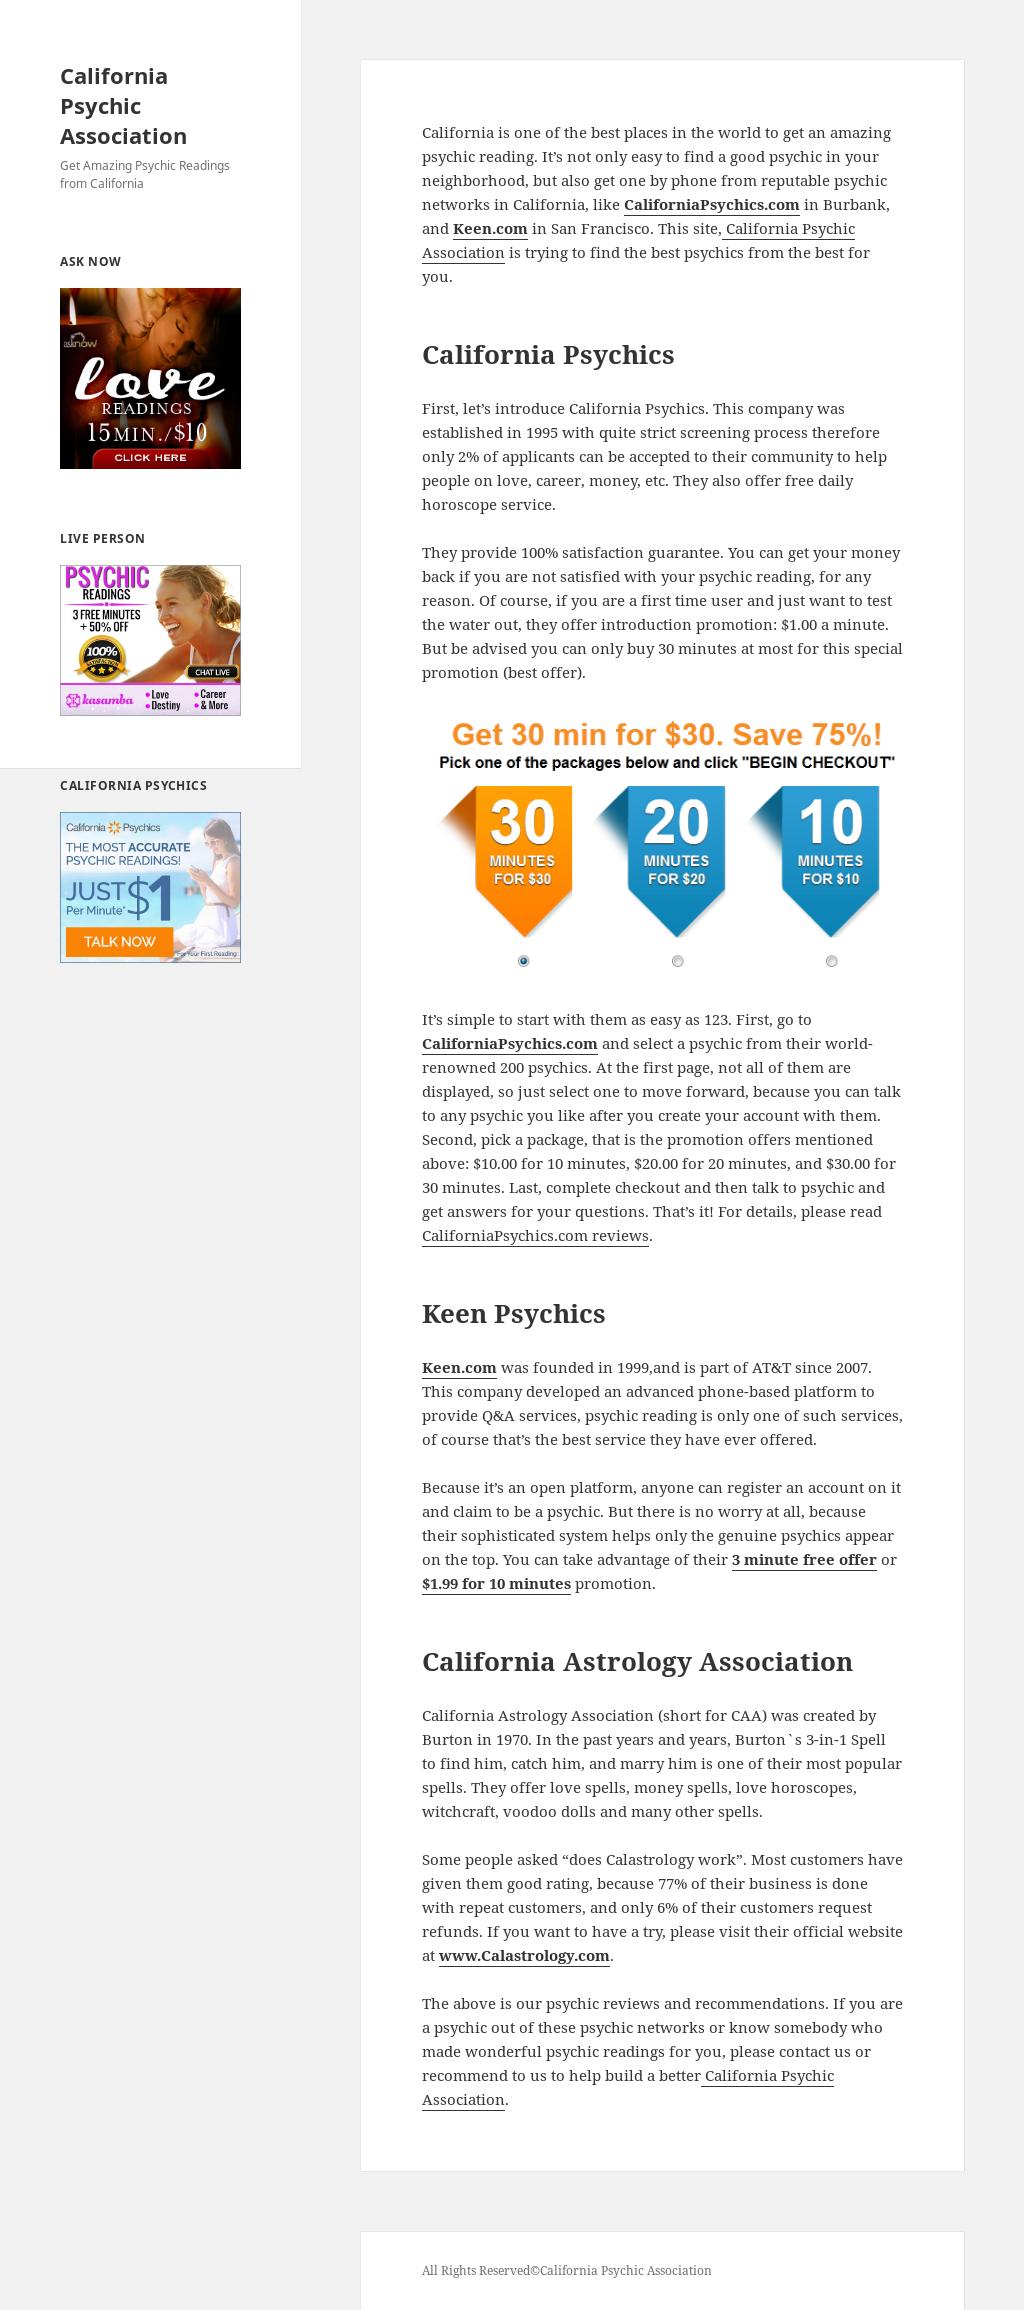 California Psychic Association Competitors, Revenue and